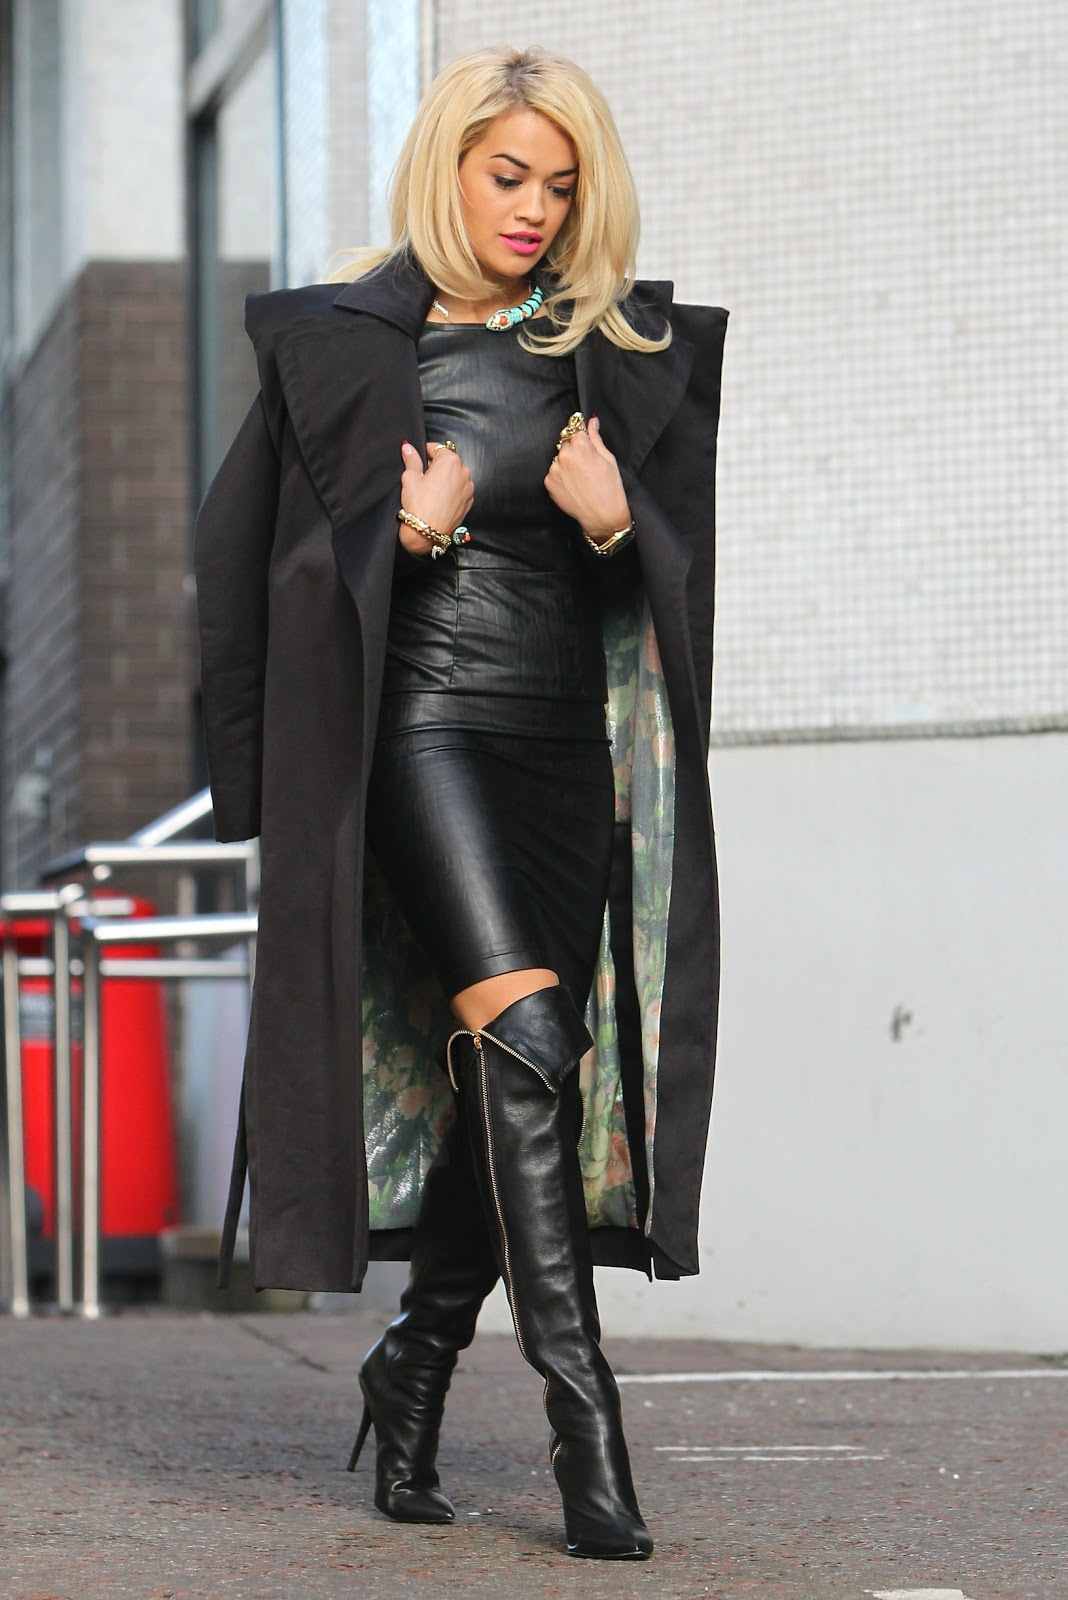 Moda abrigos y botas